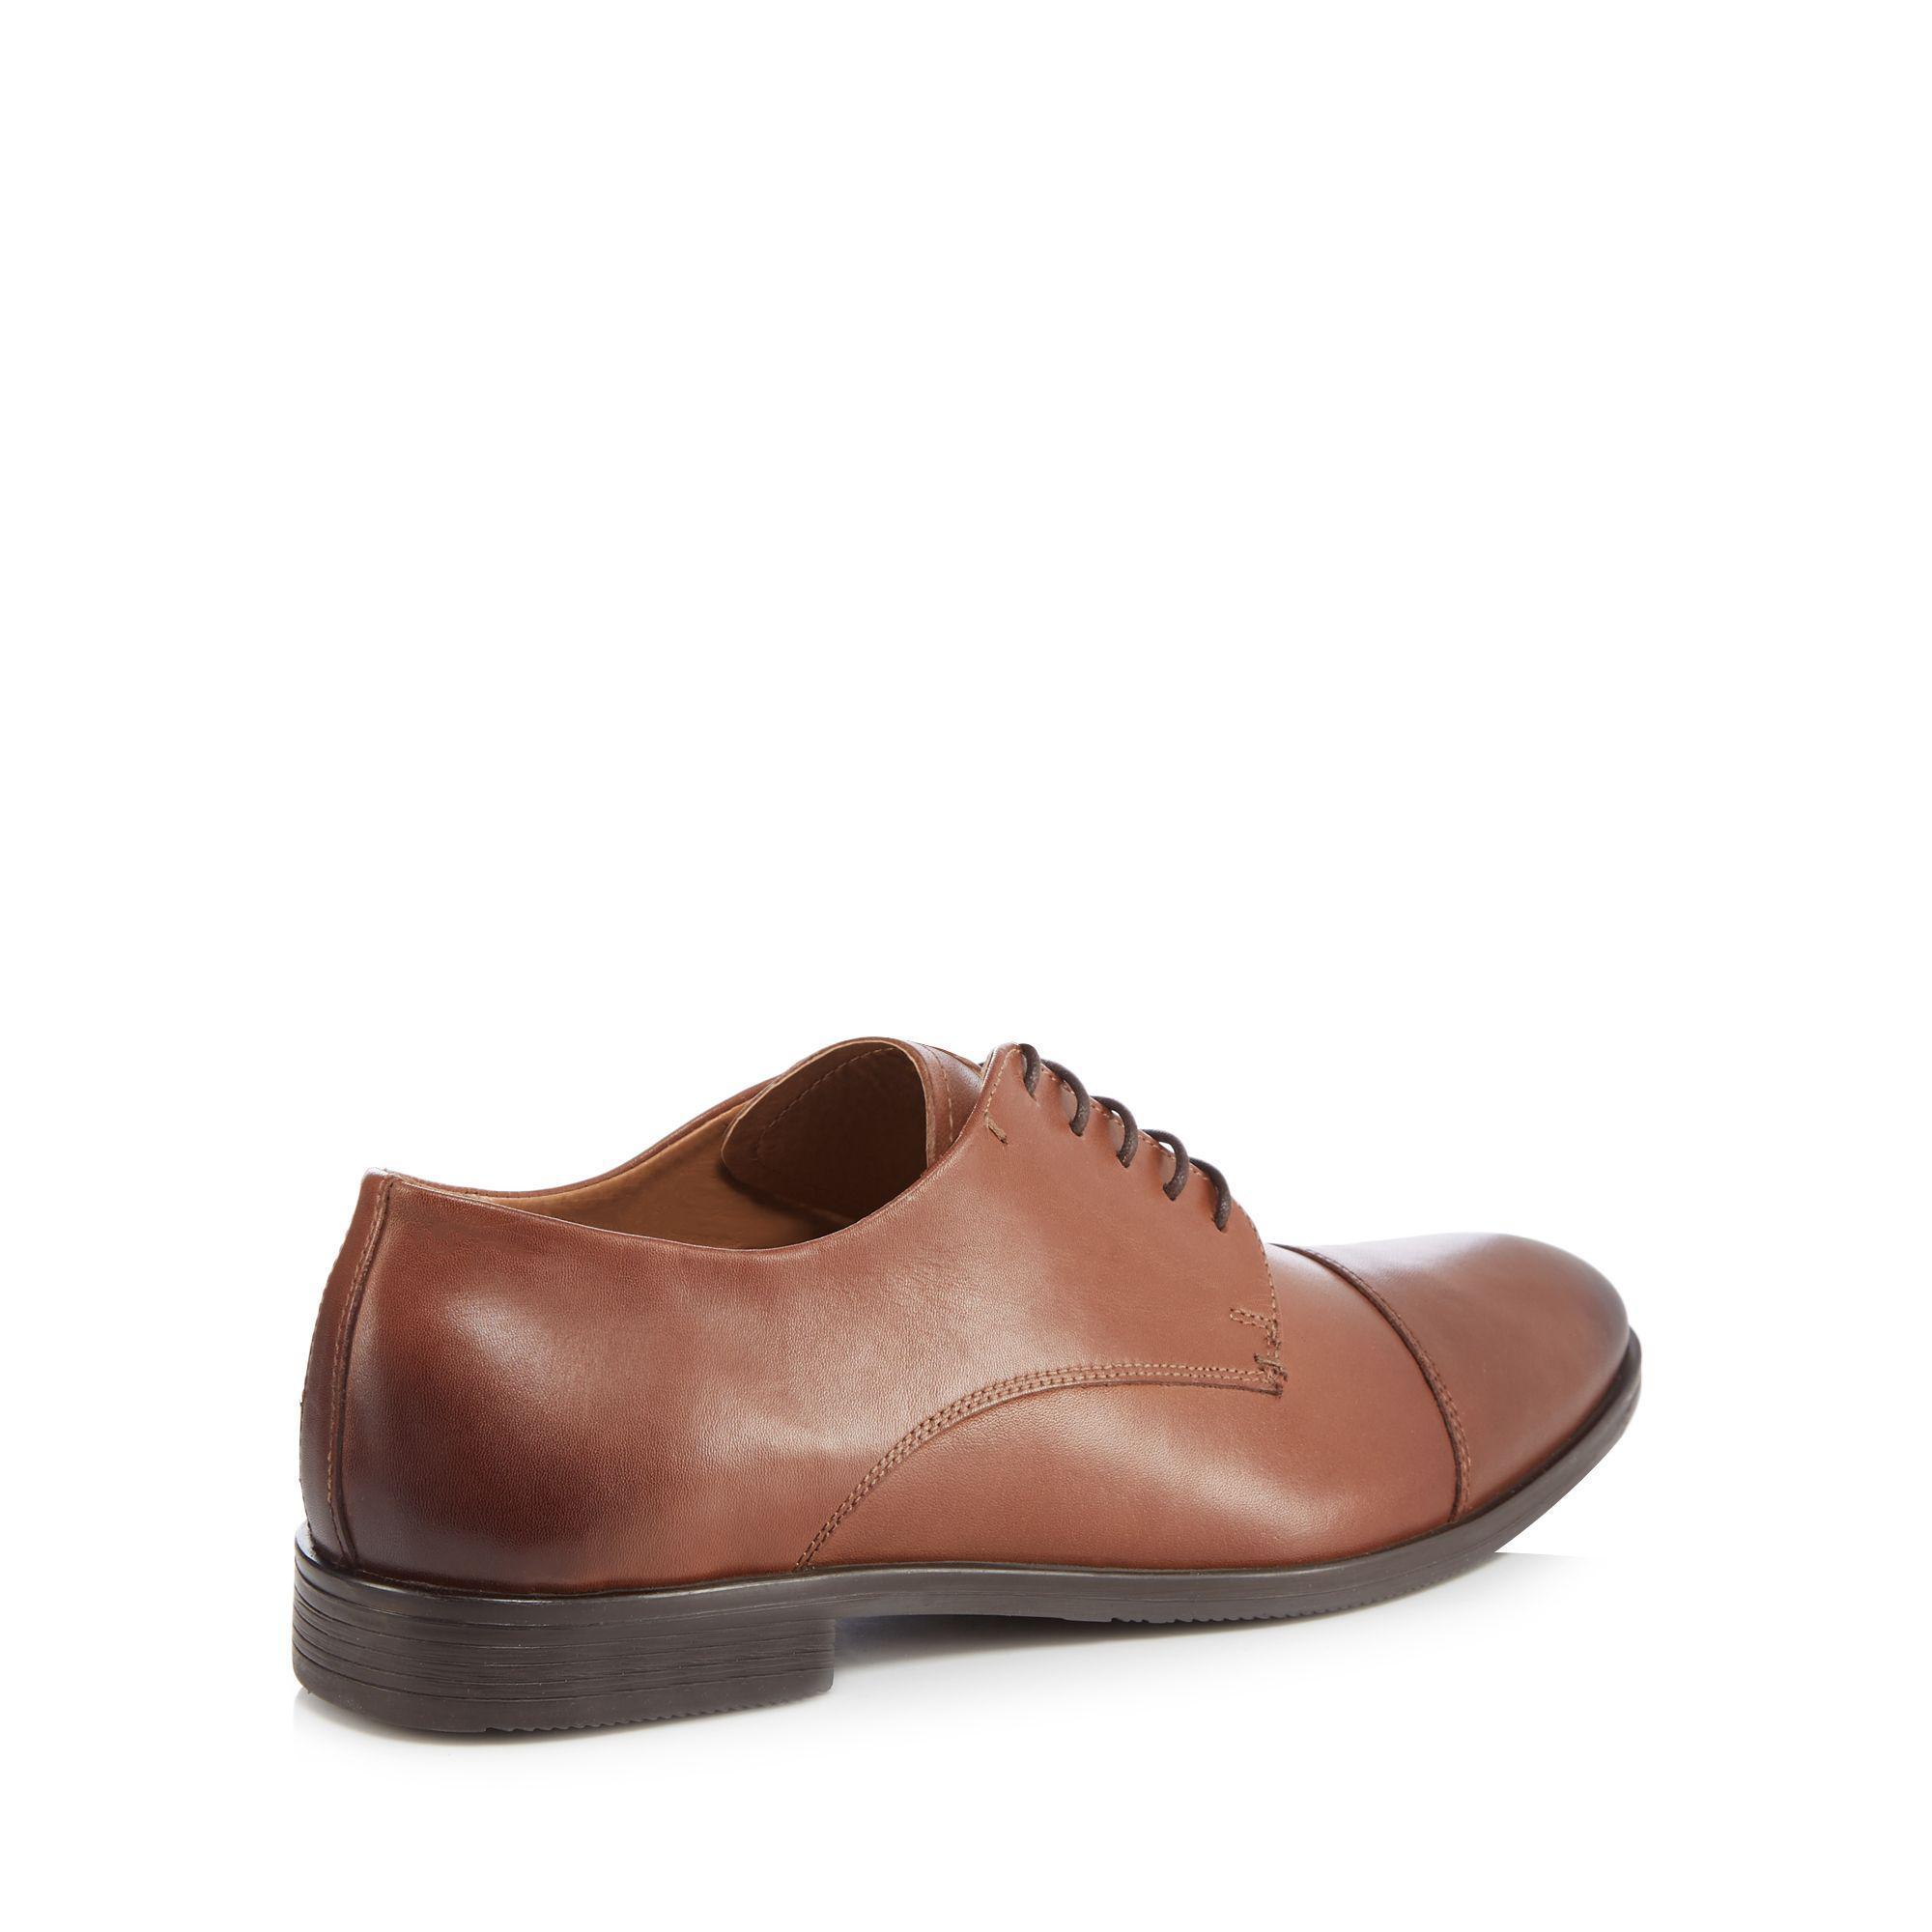 sale best place Dark tan leather 'Noah' Derby shoes clearance official site n6Kr0kn02